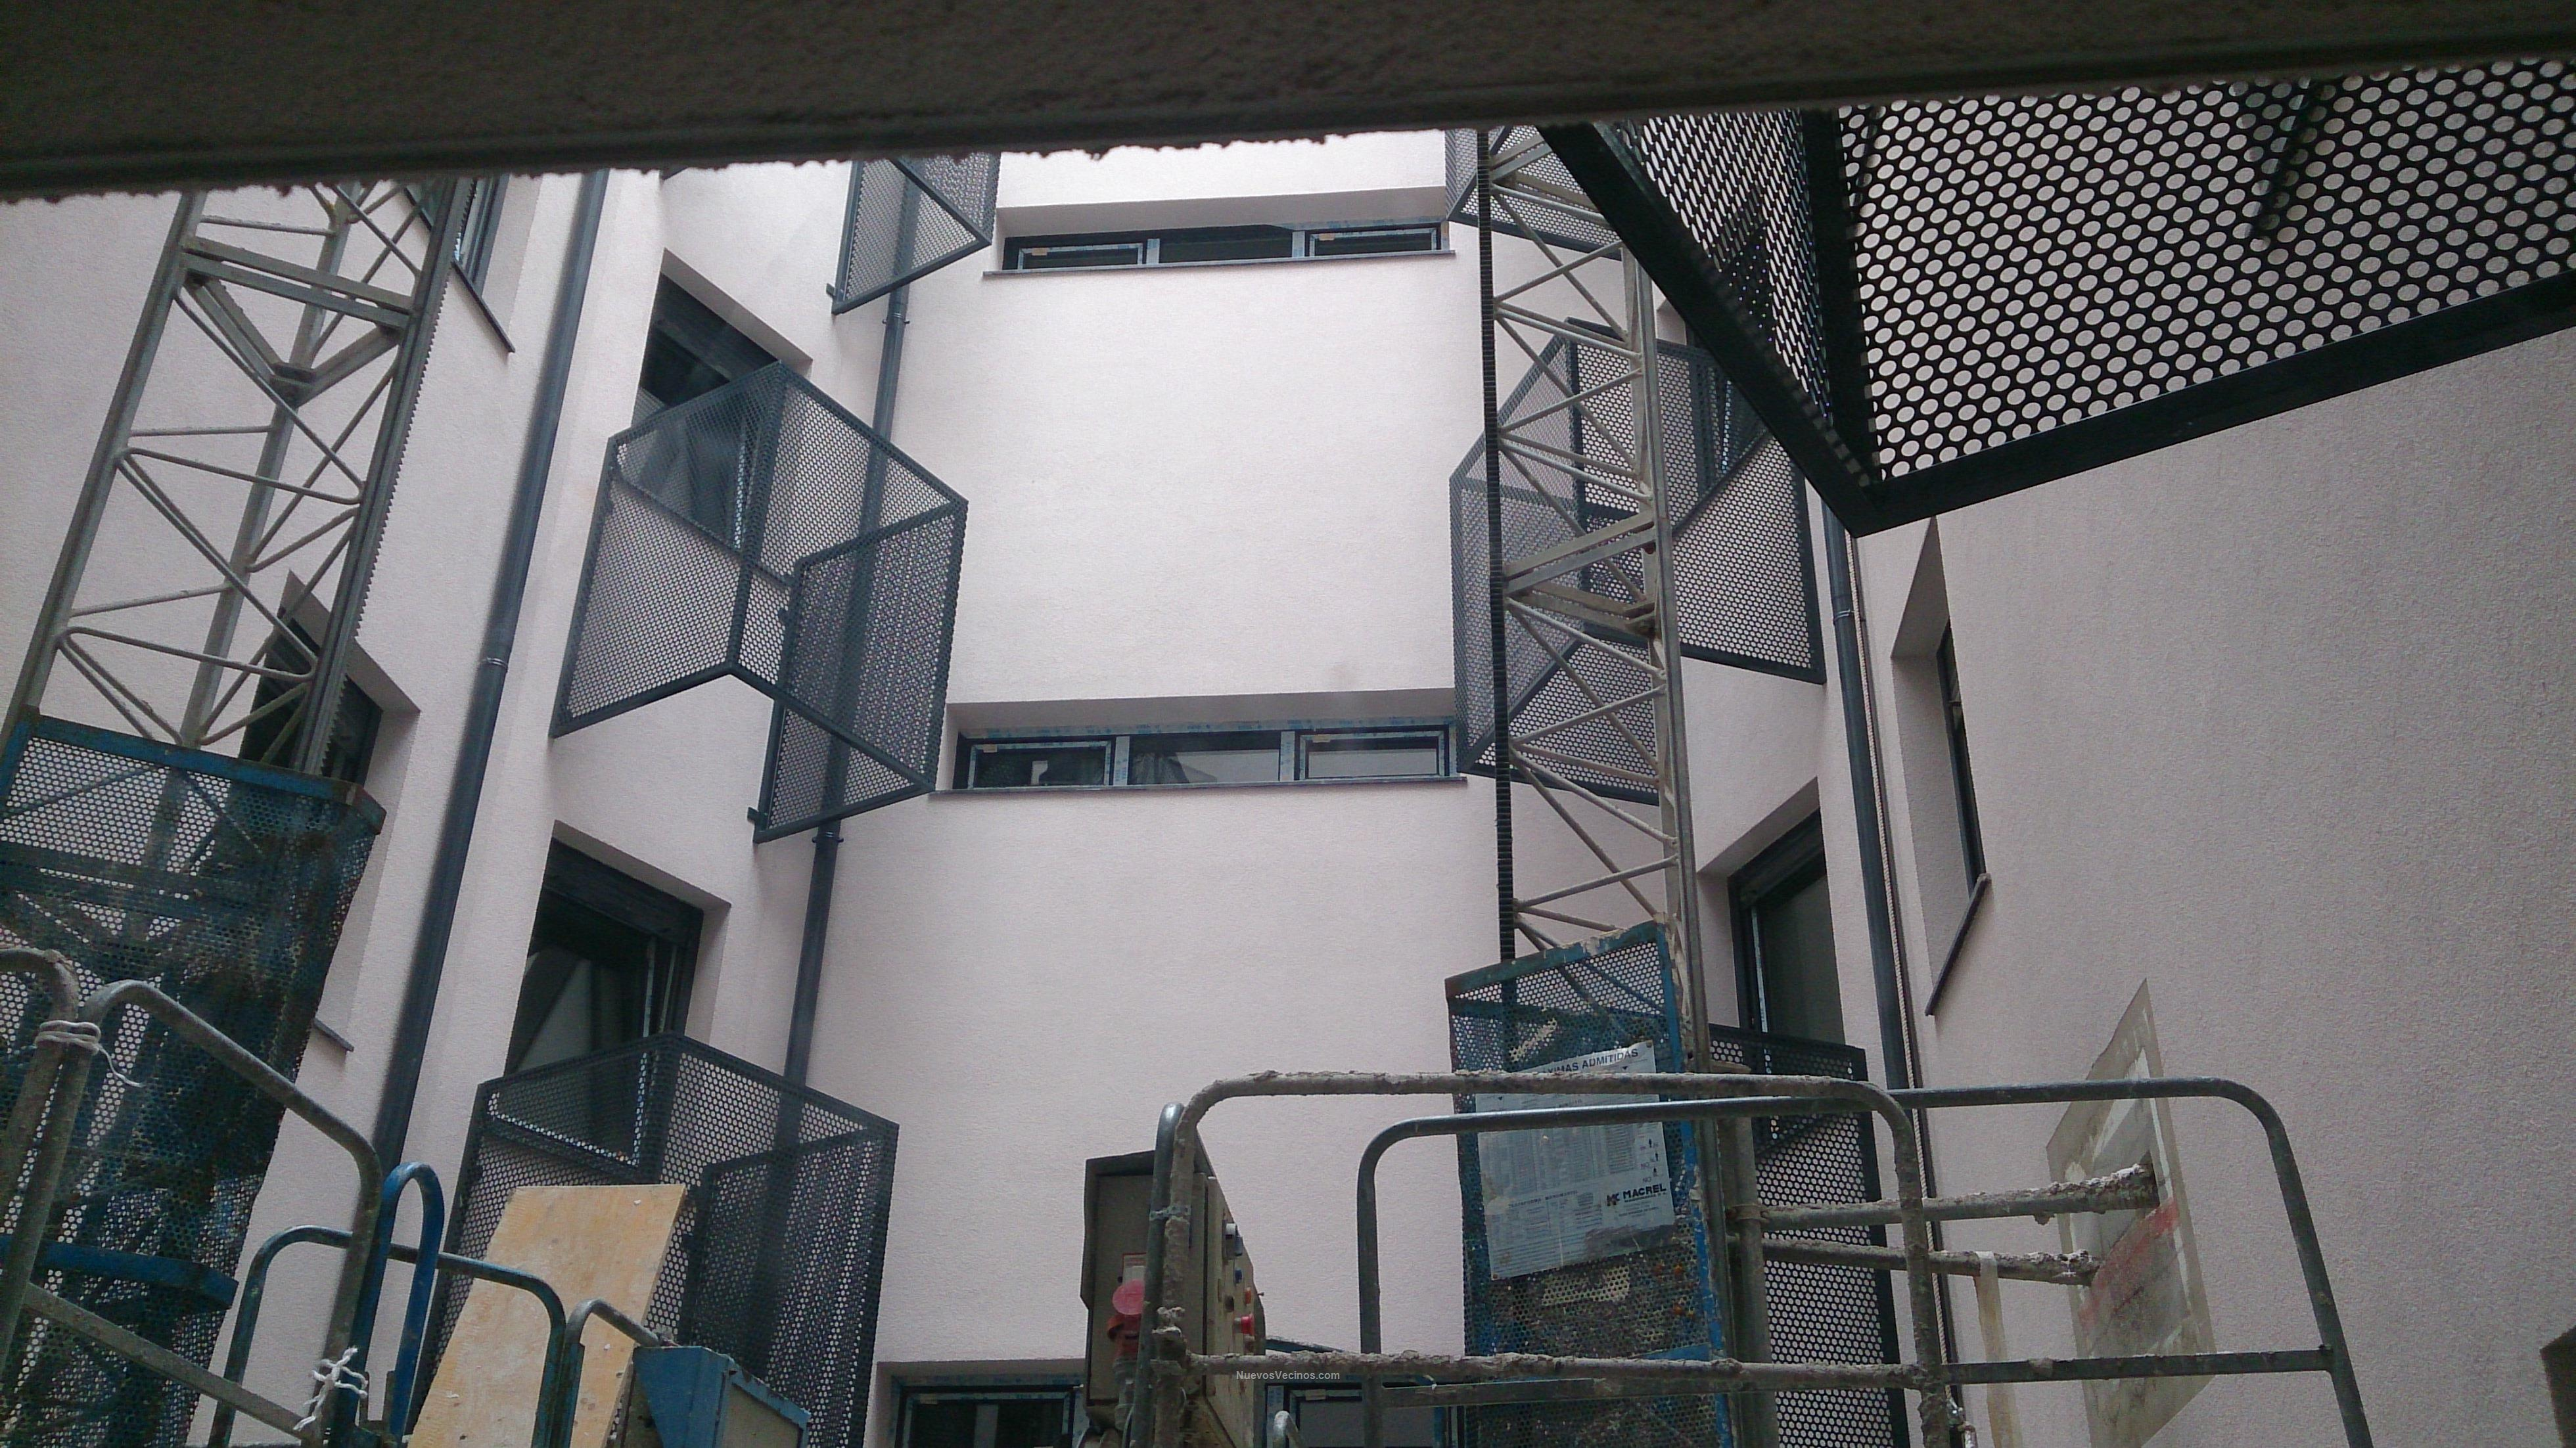 Erandio goikoa s coop fotos tendederos patio - Tendederos de interior ...